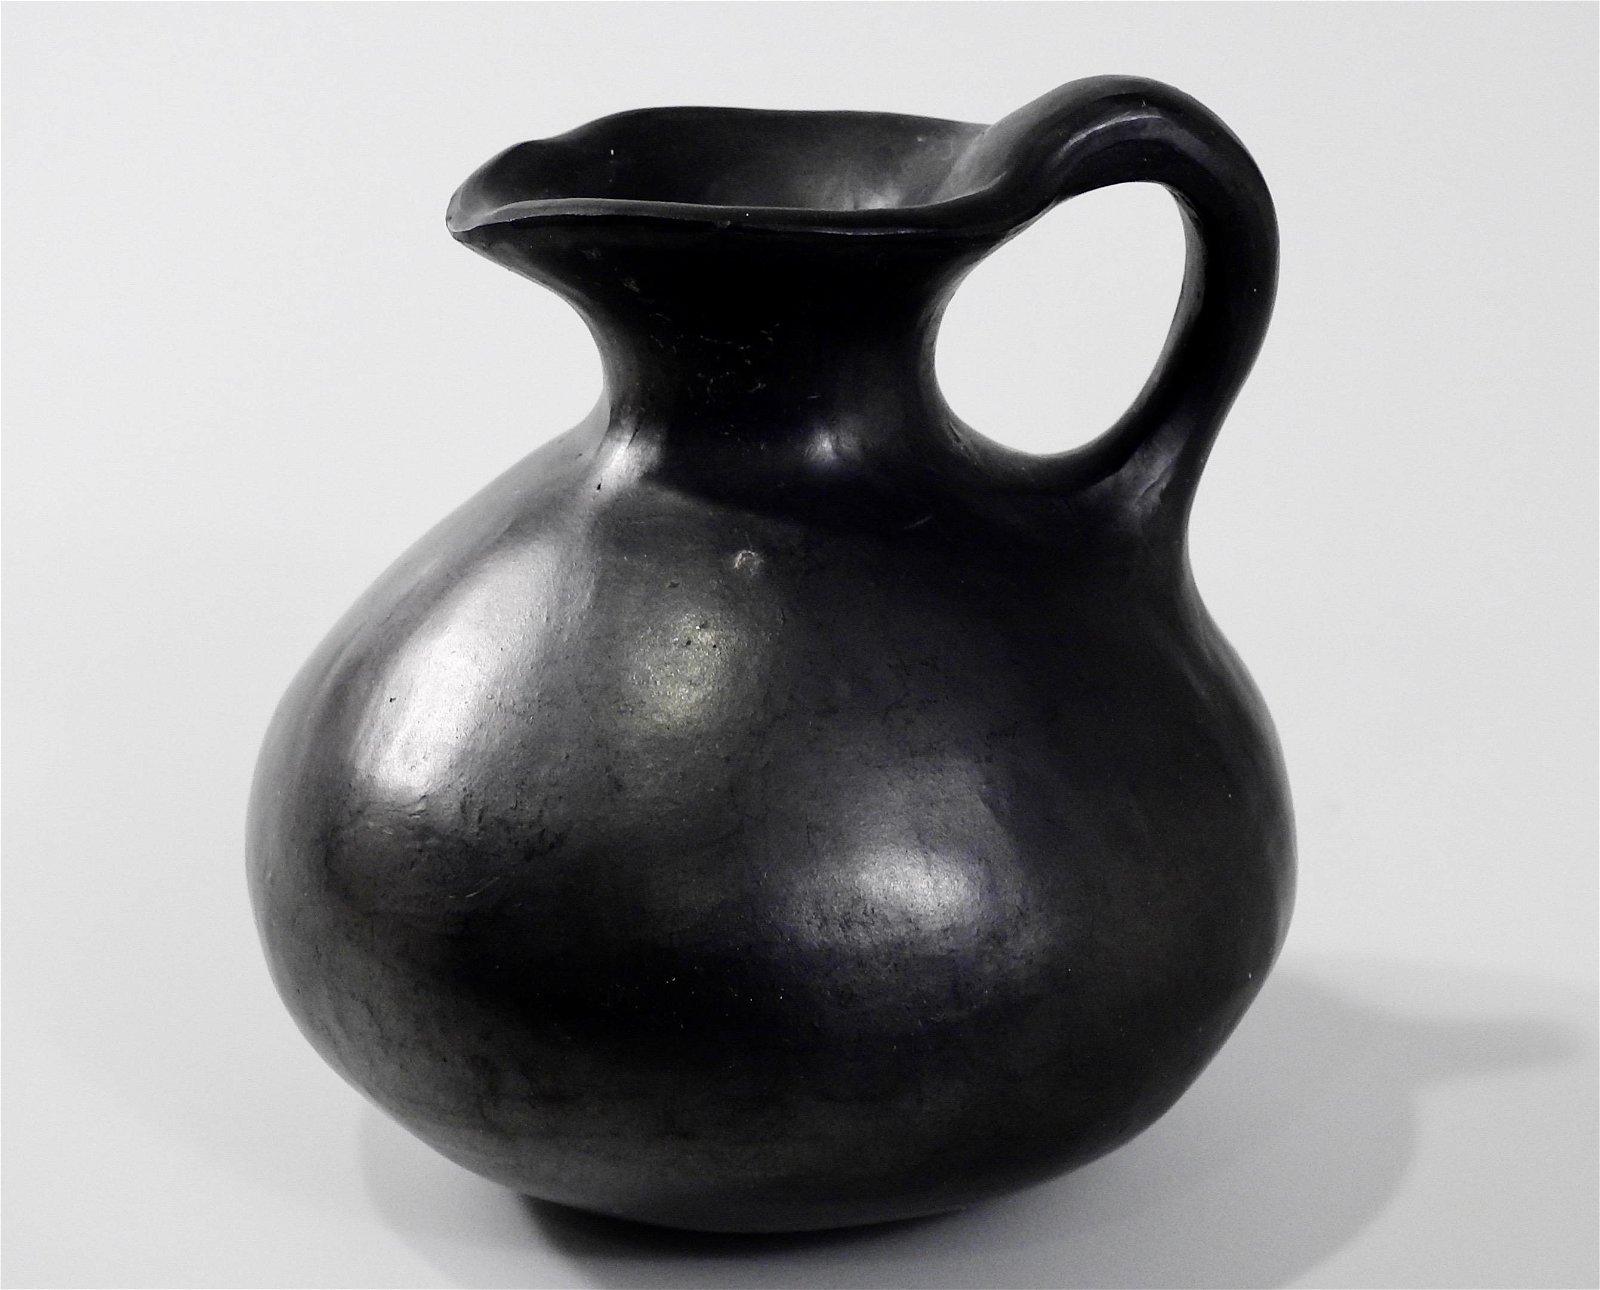 Basalt Clay Black Pottery Hand Made Jug Folk Art Vase